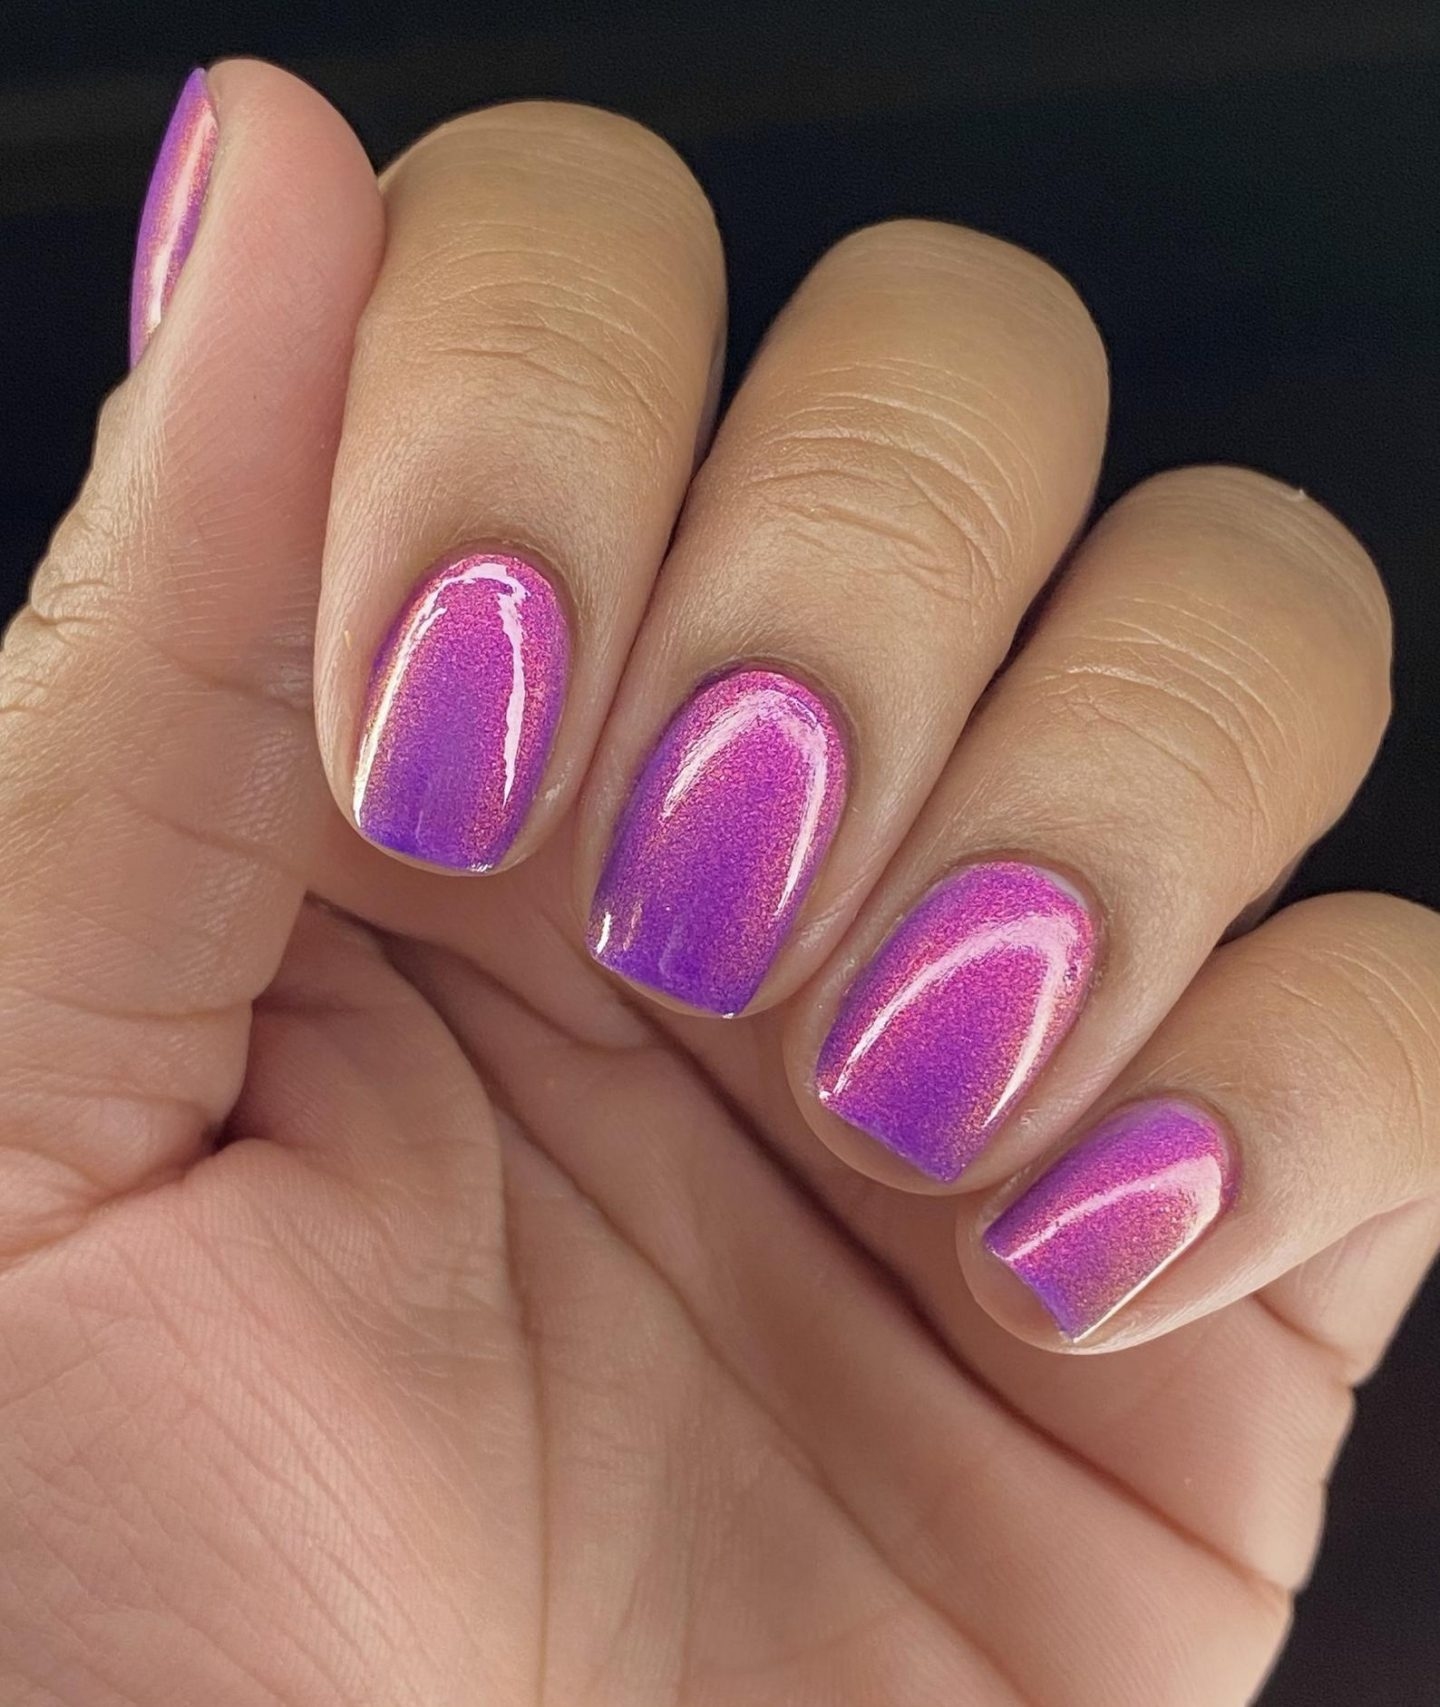 Short holographic purple nails